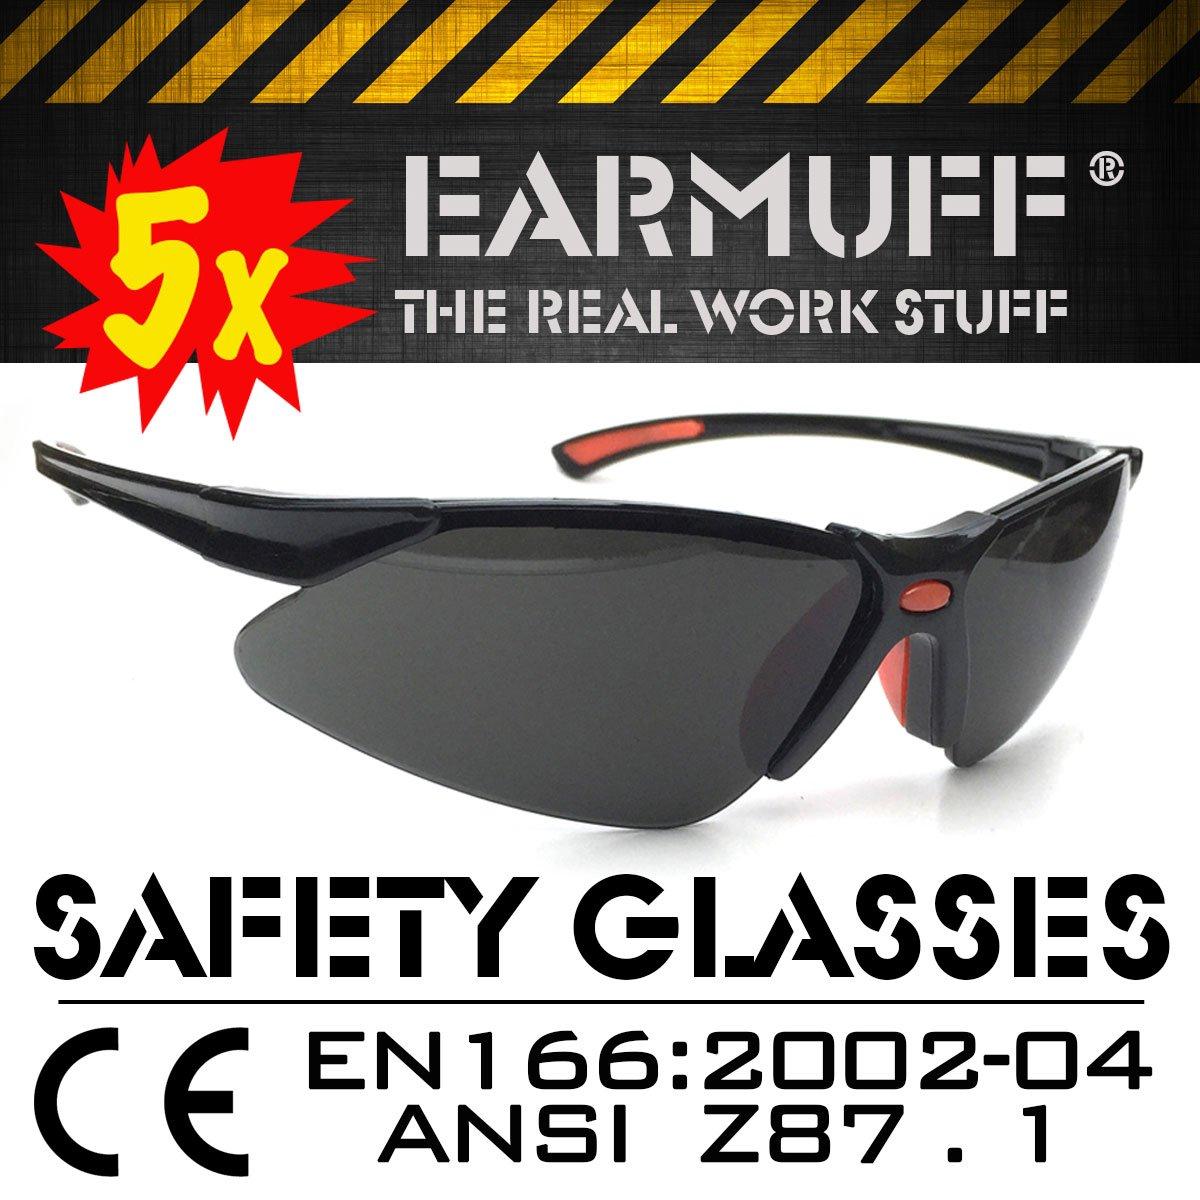 5x SET *STINGER* Sport Schutzbrille, Sicherheitsbrille, Schieß brille, Arbeitsschutzbrille, Bikerbrille, Sonnenbrille nach DIN EN-166 EARMUFF Germany ER9311G-5x